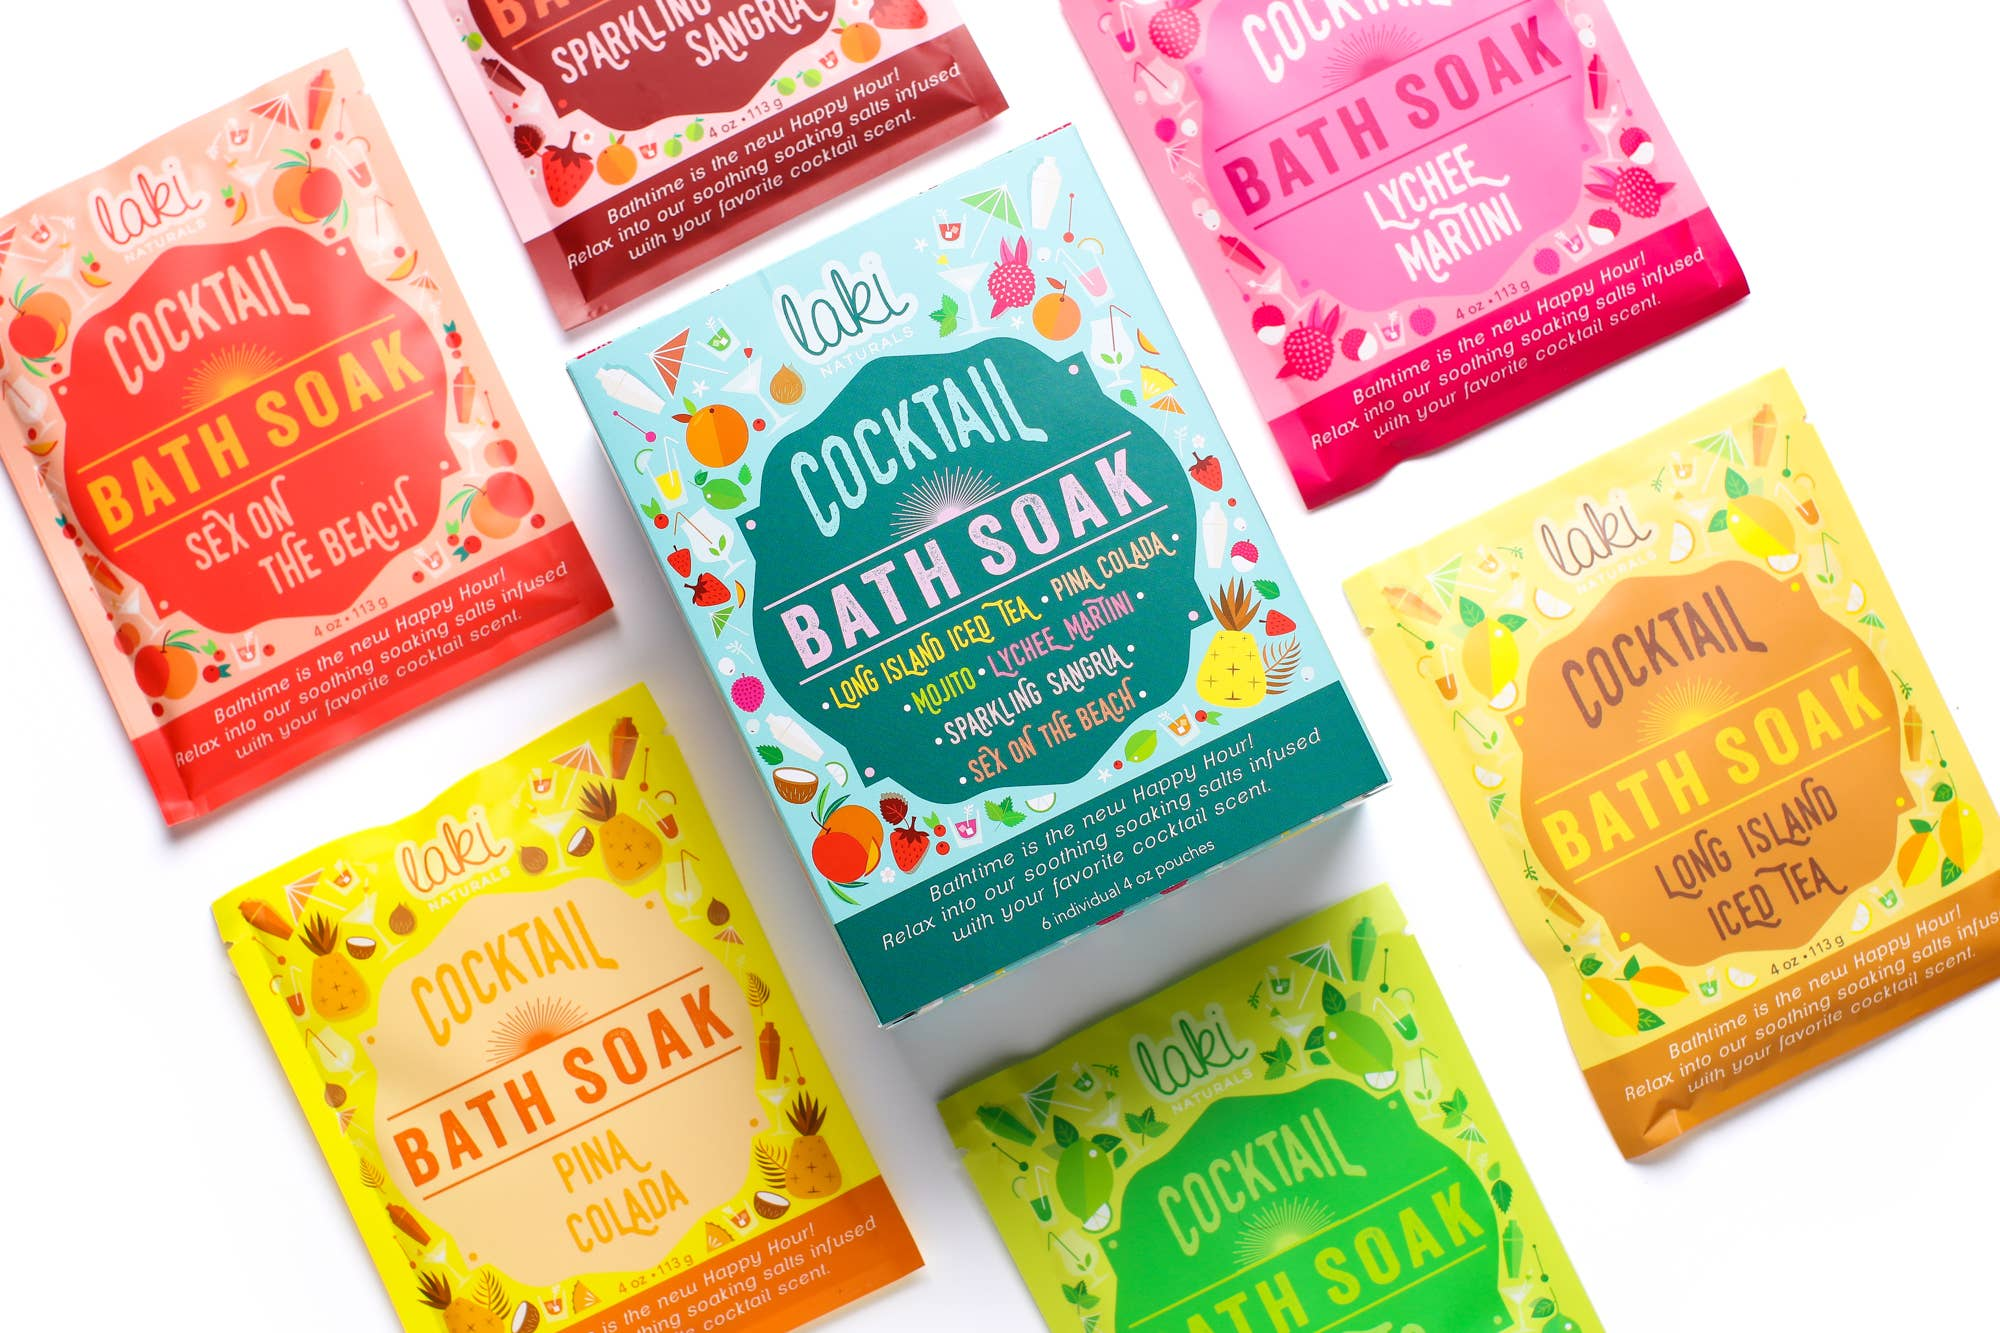 Cocktail Bath Soaks | Trada Marketplace